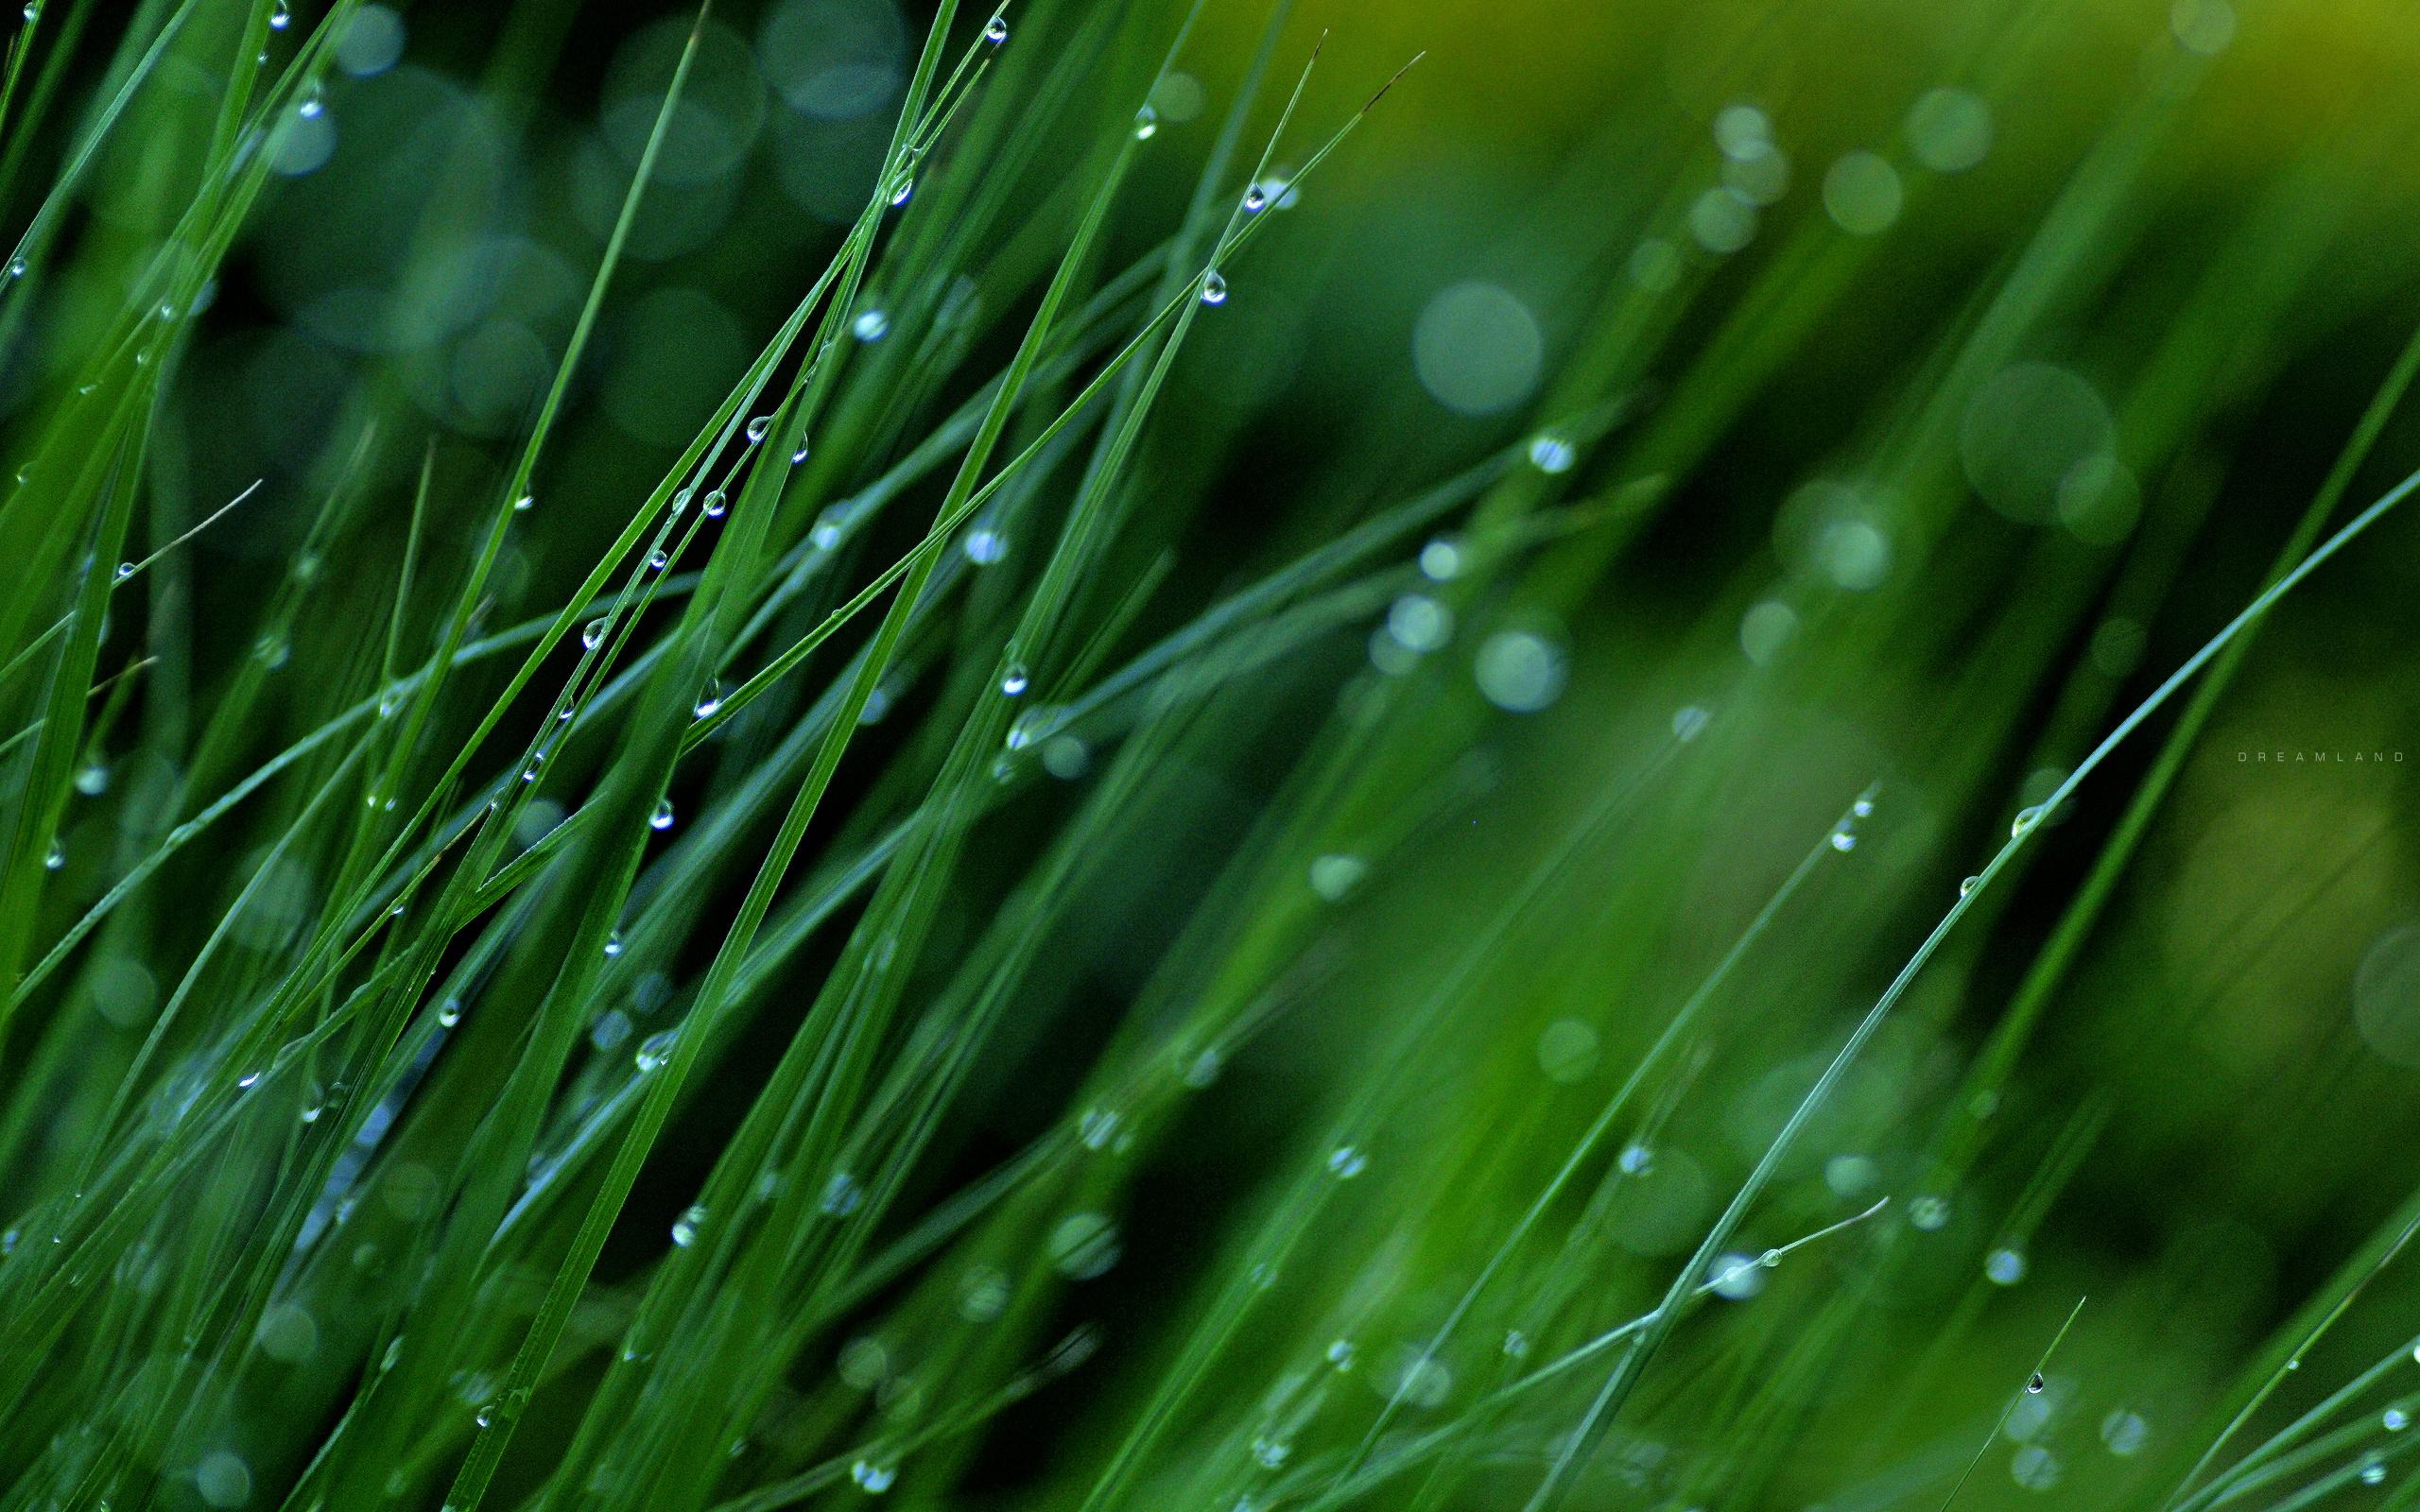 природа роса вода капли макро трава nature Rosa water drops macro grass без смс